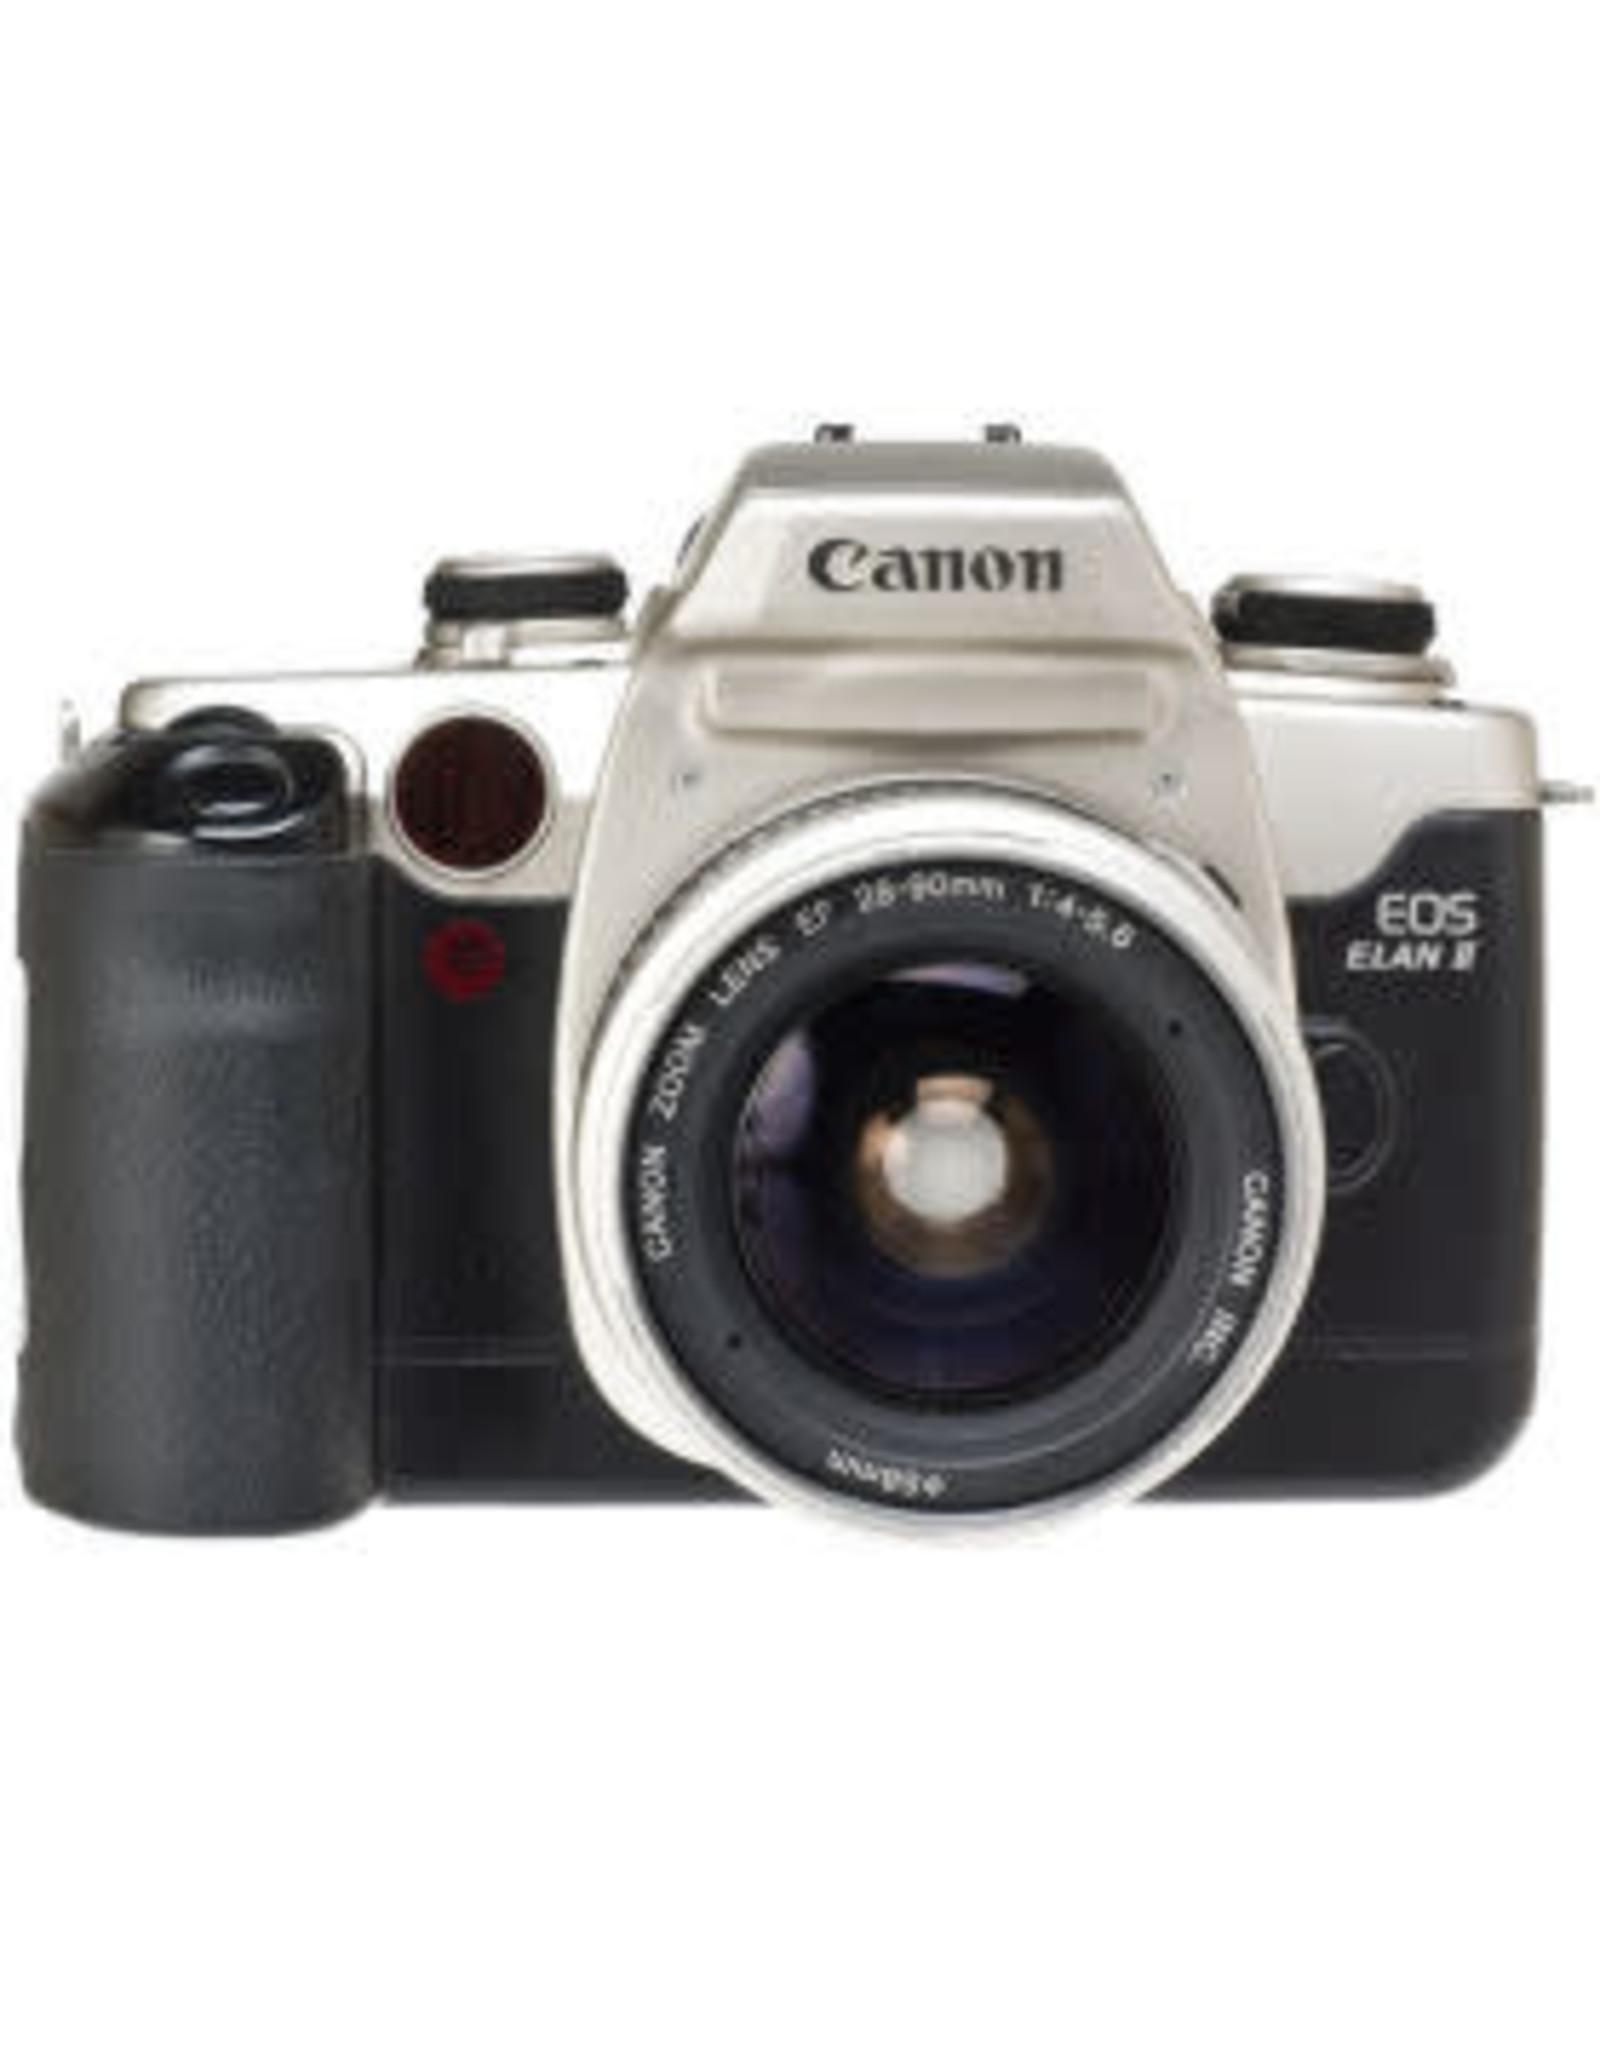 Canon Canon Elan II 35mm SLR w/35-80mm lens Semester Rental